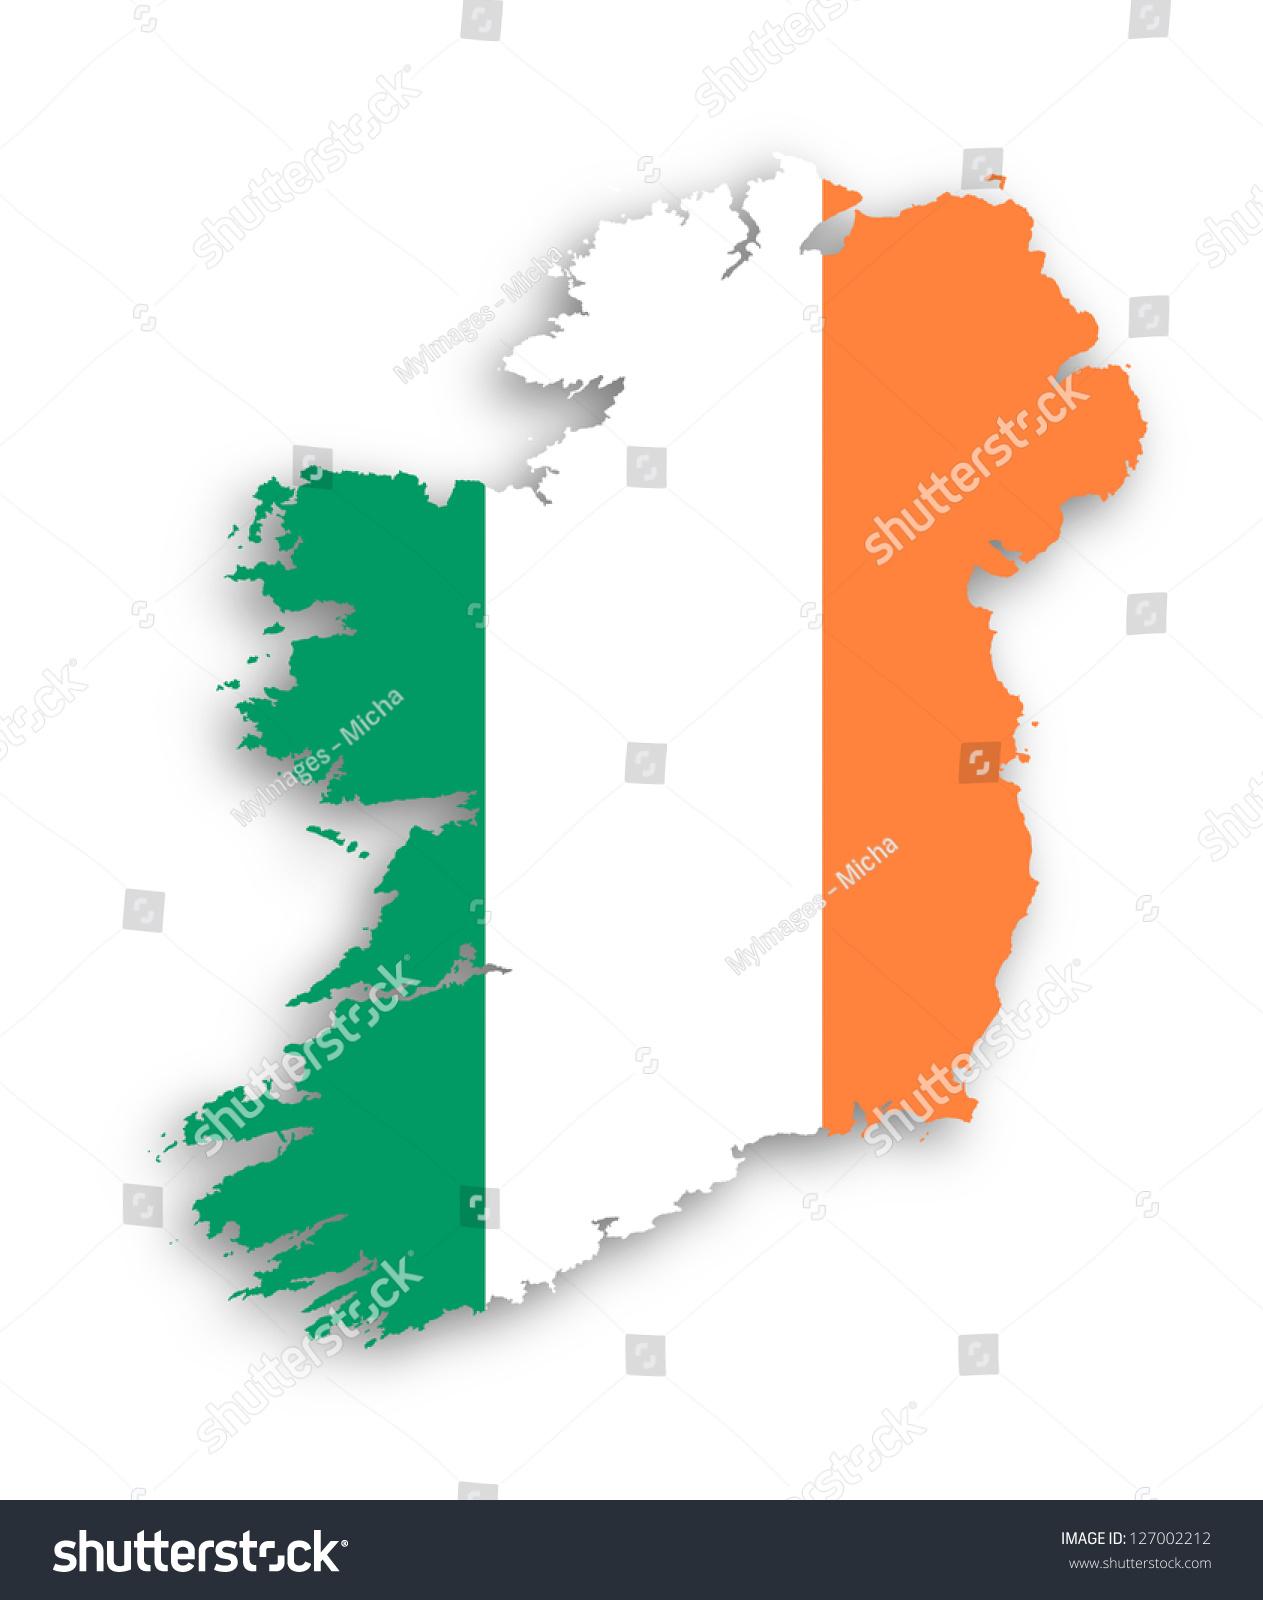 How to draw ireland flag